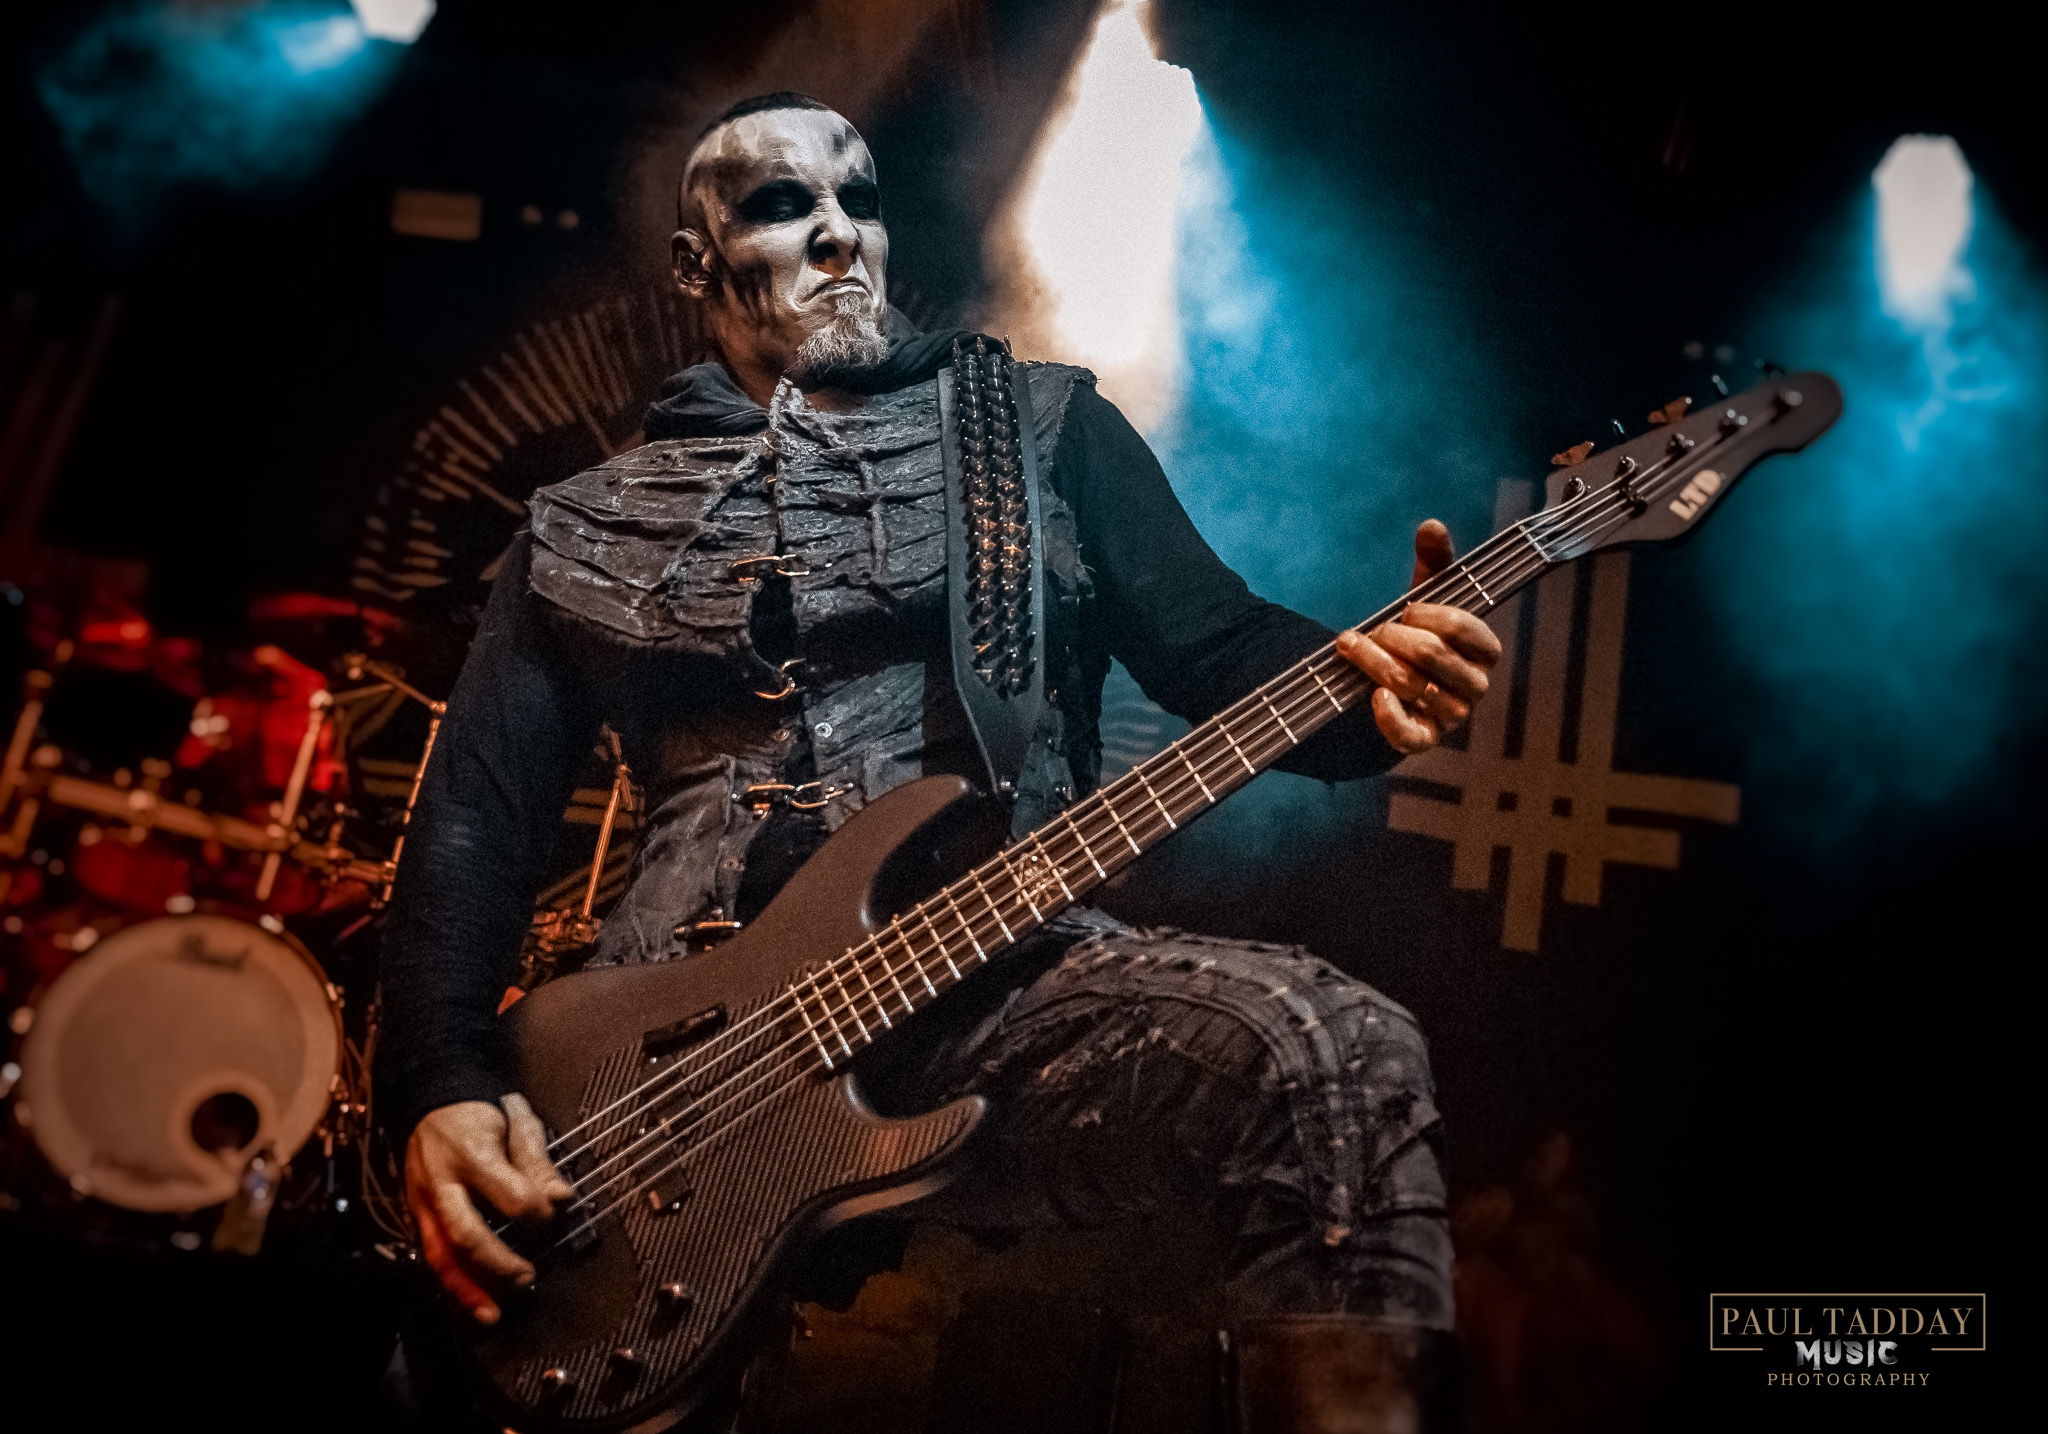 behemoth - brisbane - march 7 2019 - web - paul tadday photography - 25.jpg